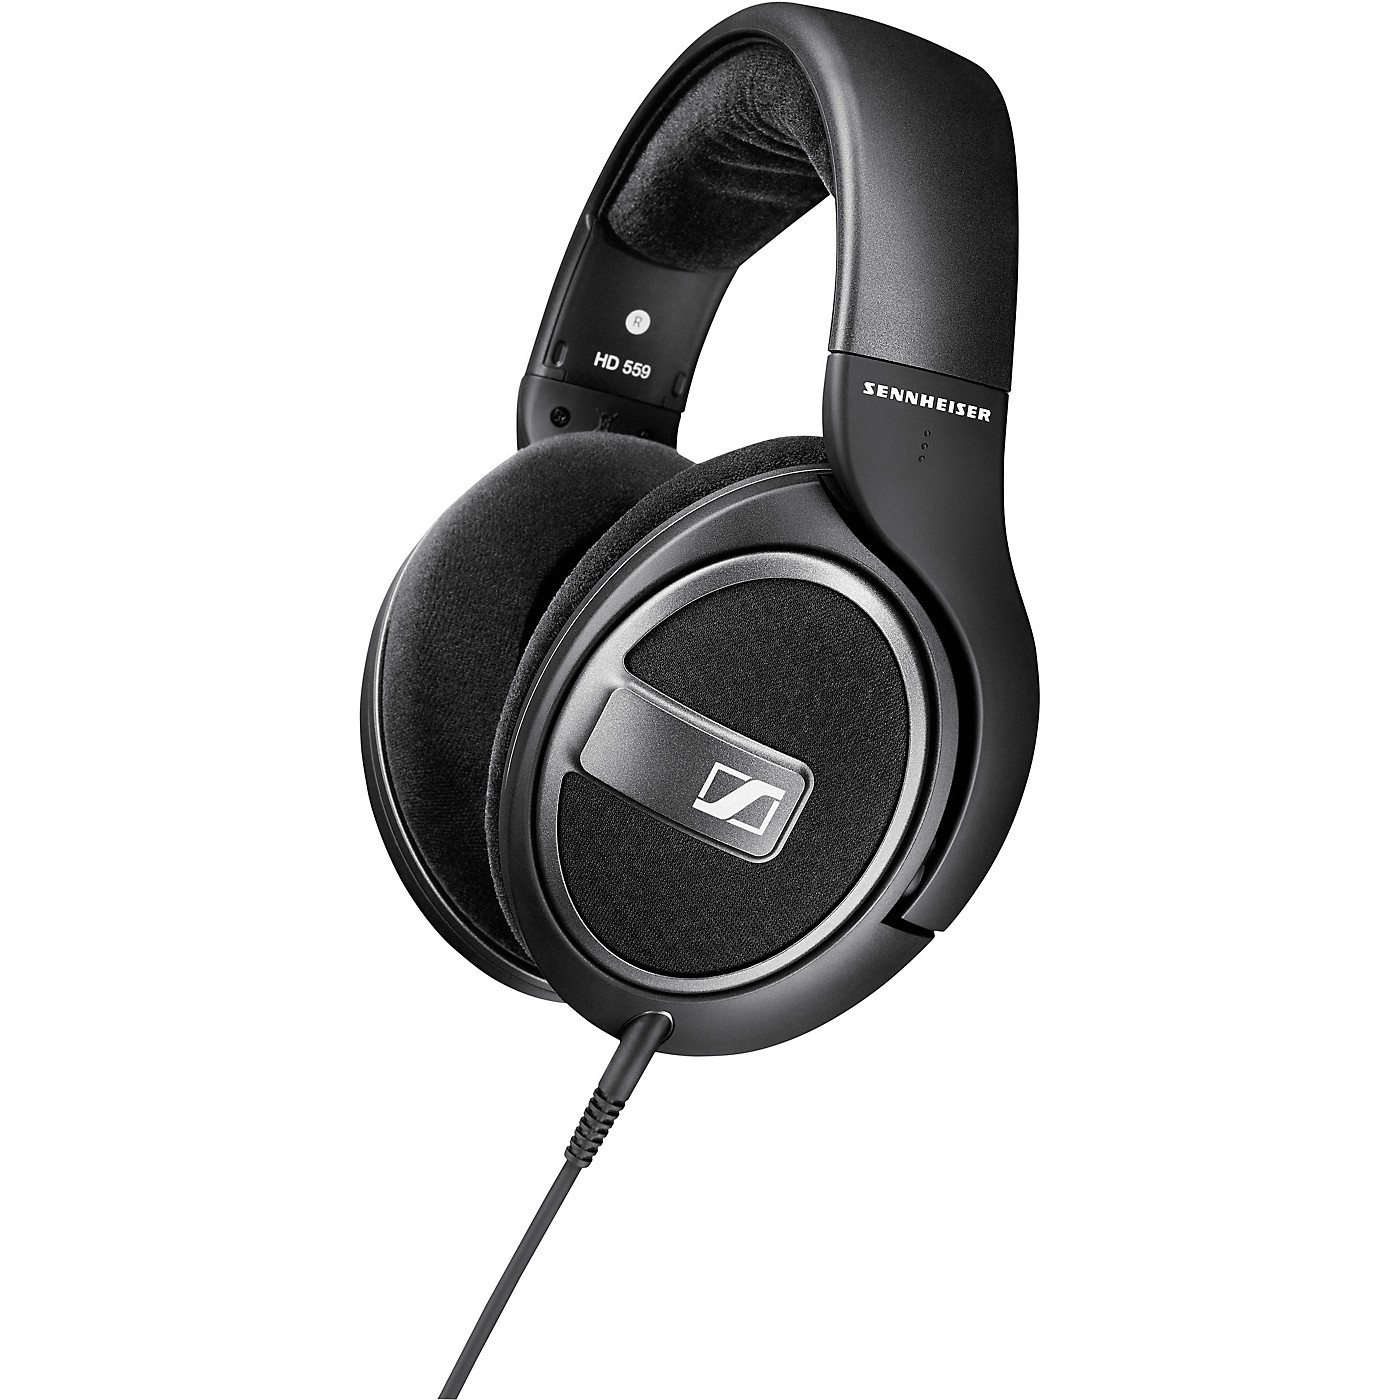 Sennheiser HD 559 Open-Back Headphones Black thumbnail